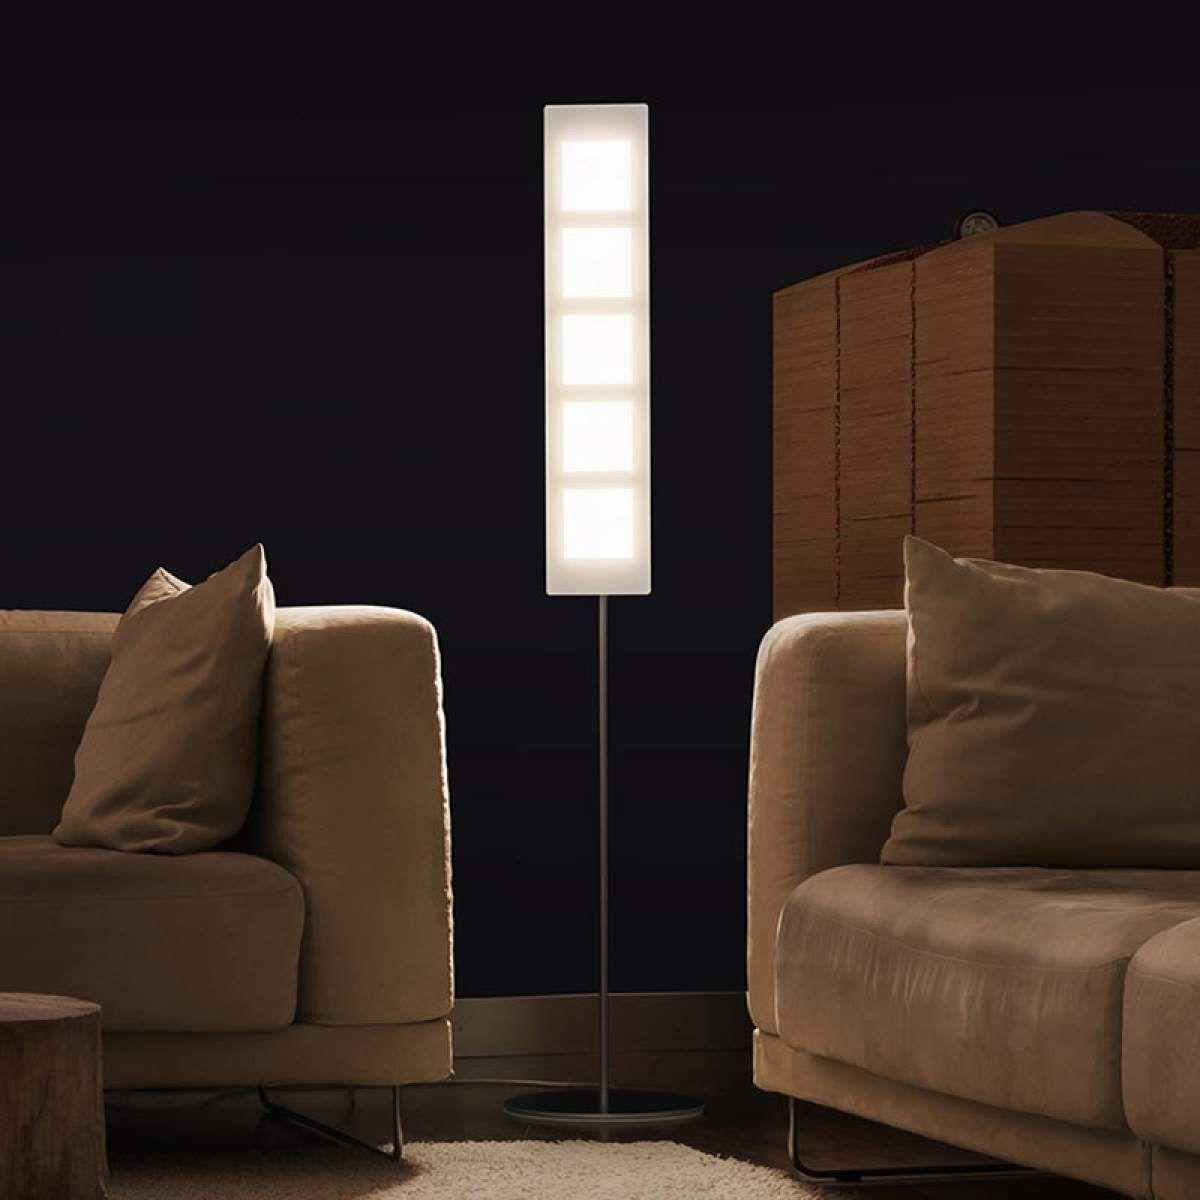 Moderne Oled Leuchten Omled One F5 Von Omled Weiss Stehlampe Weiss